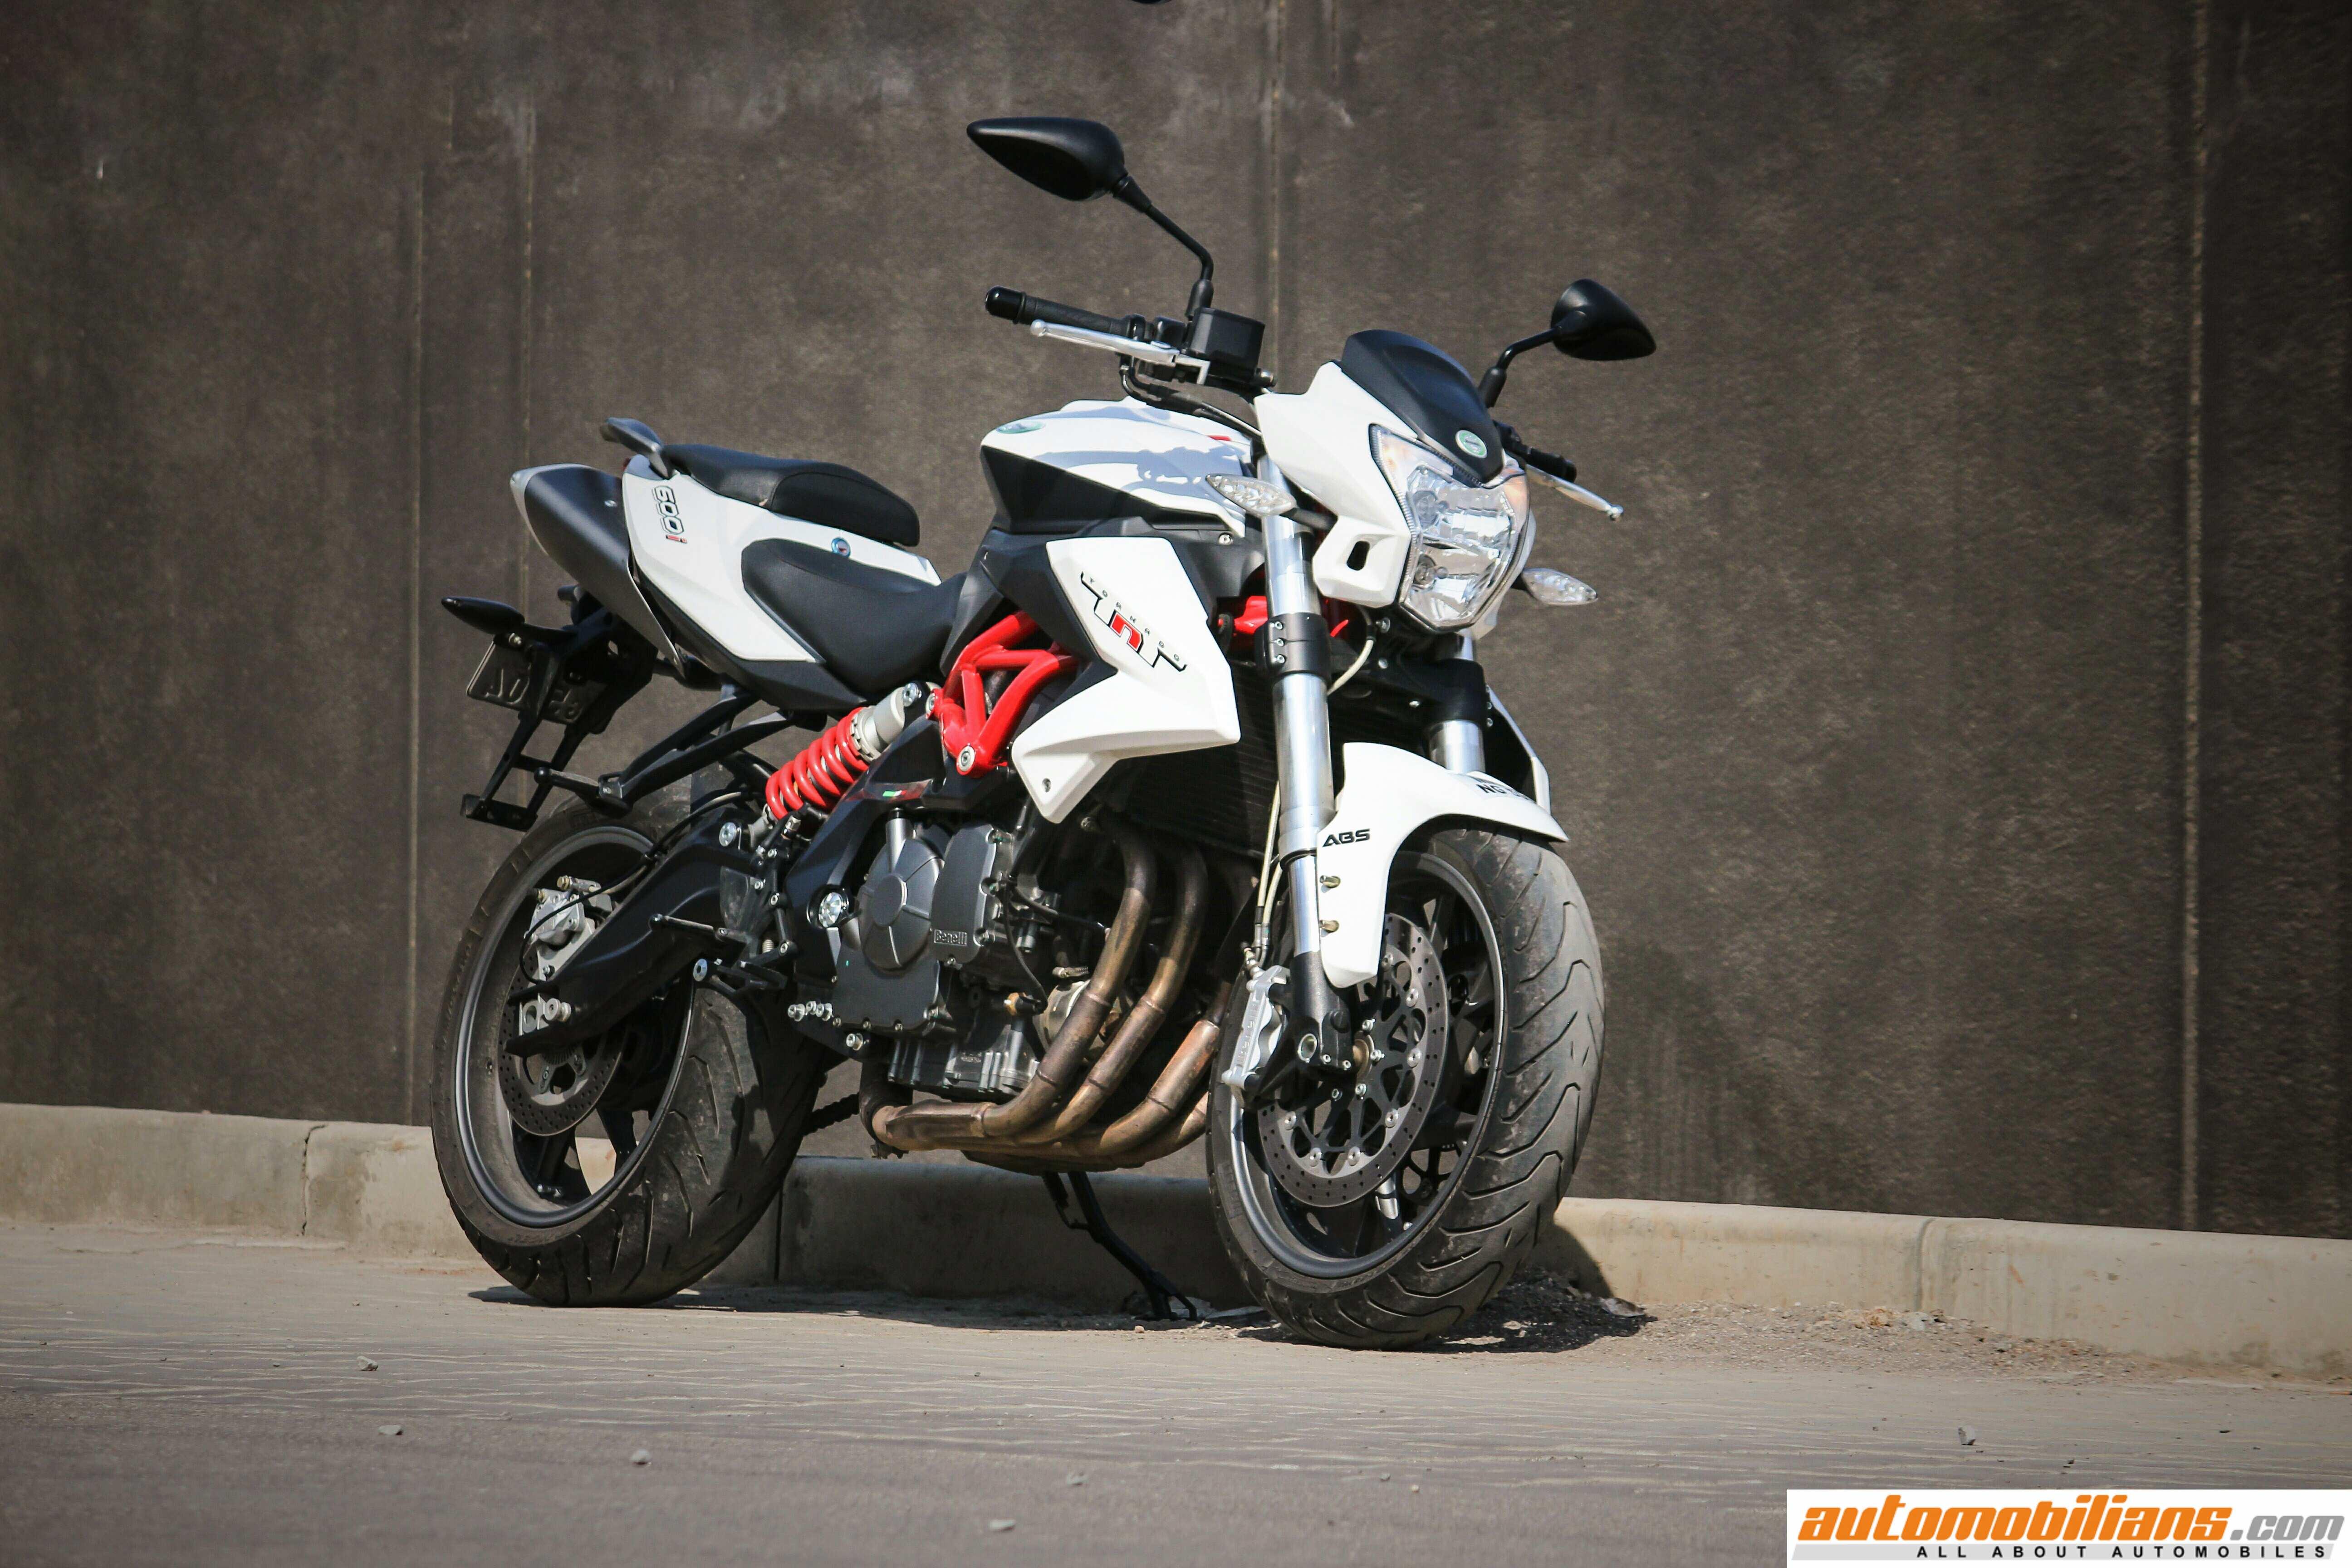 Honda Roadside Assistance >> Automobilians.com | Benelli TNT 600i ABS - Test Ride Review